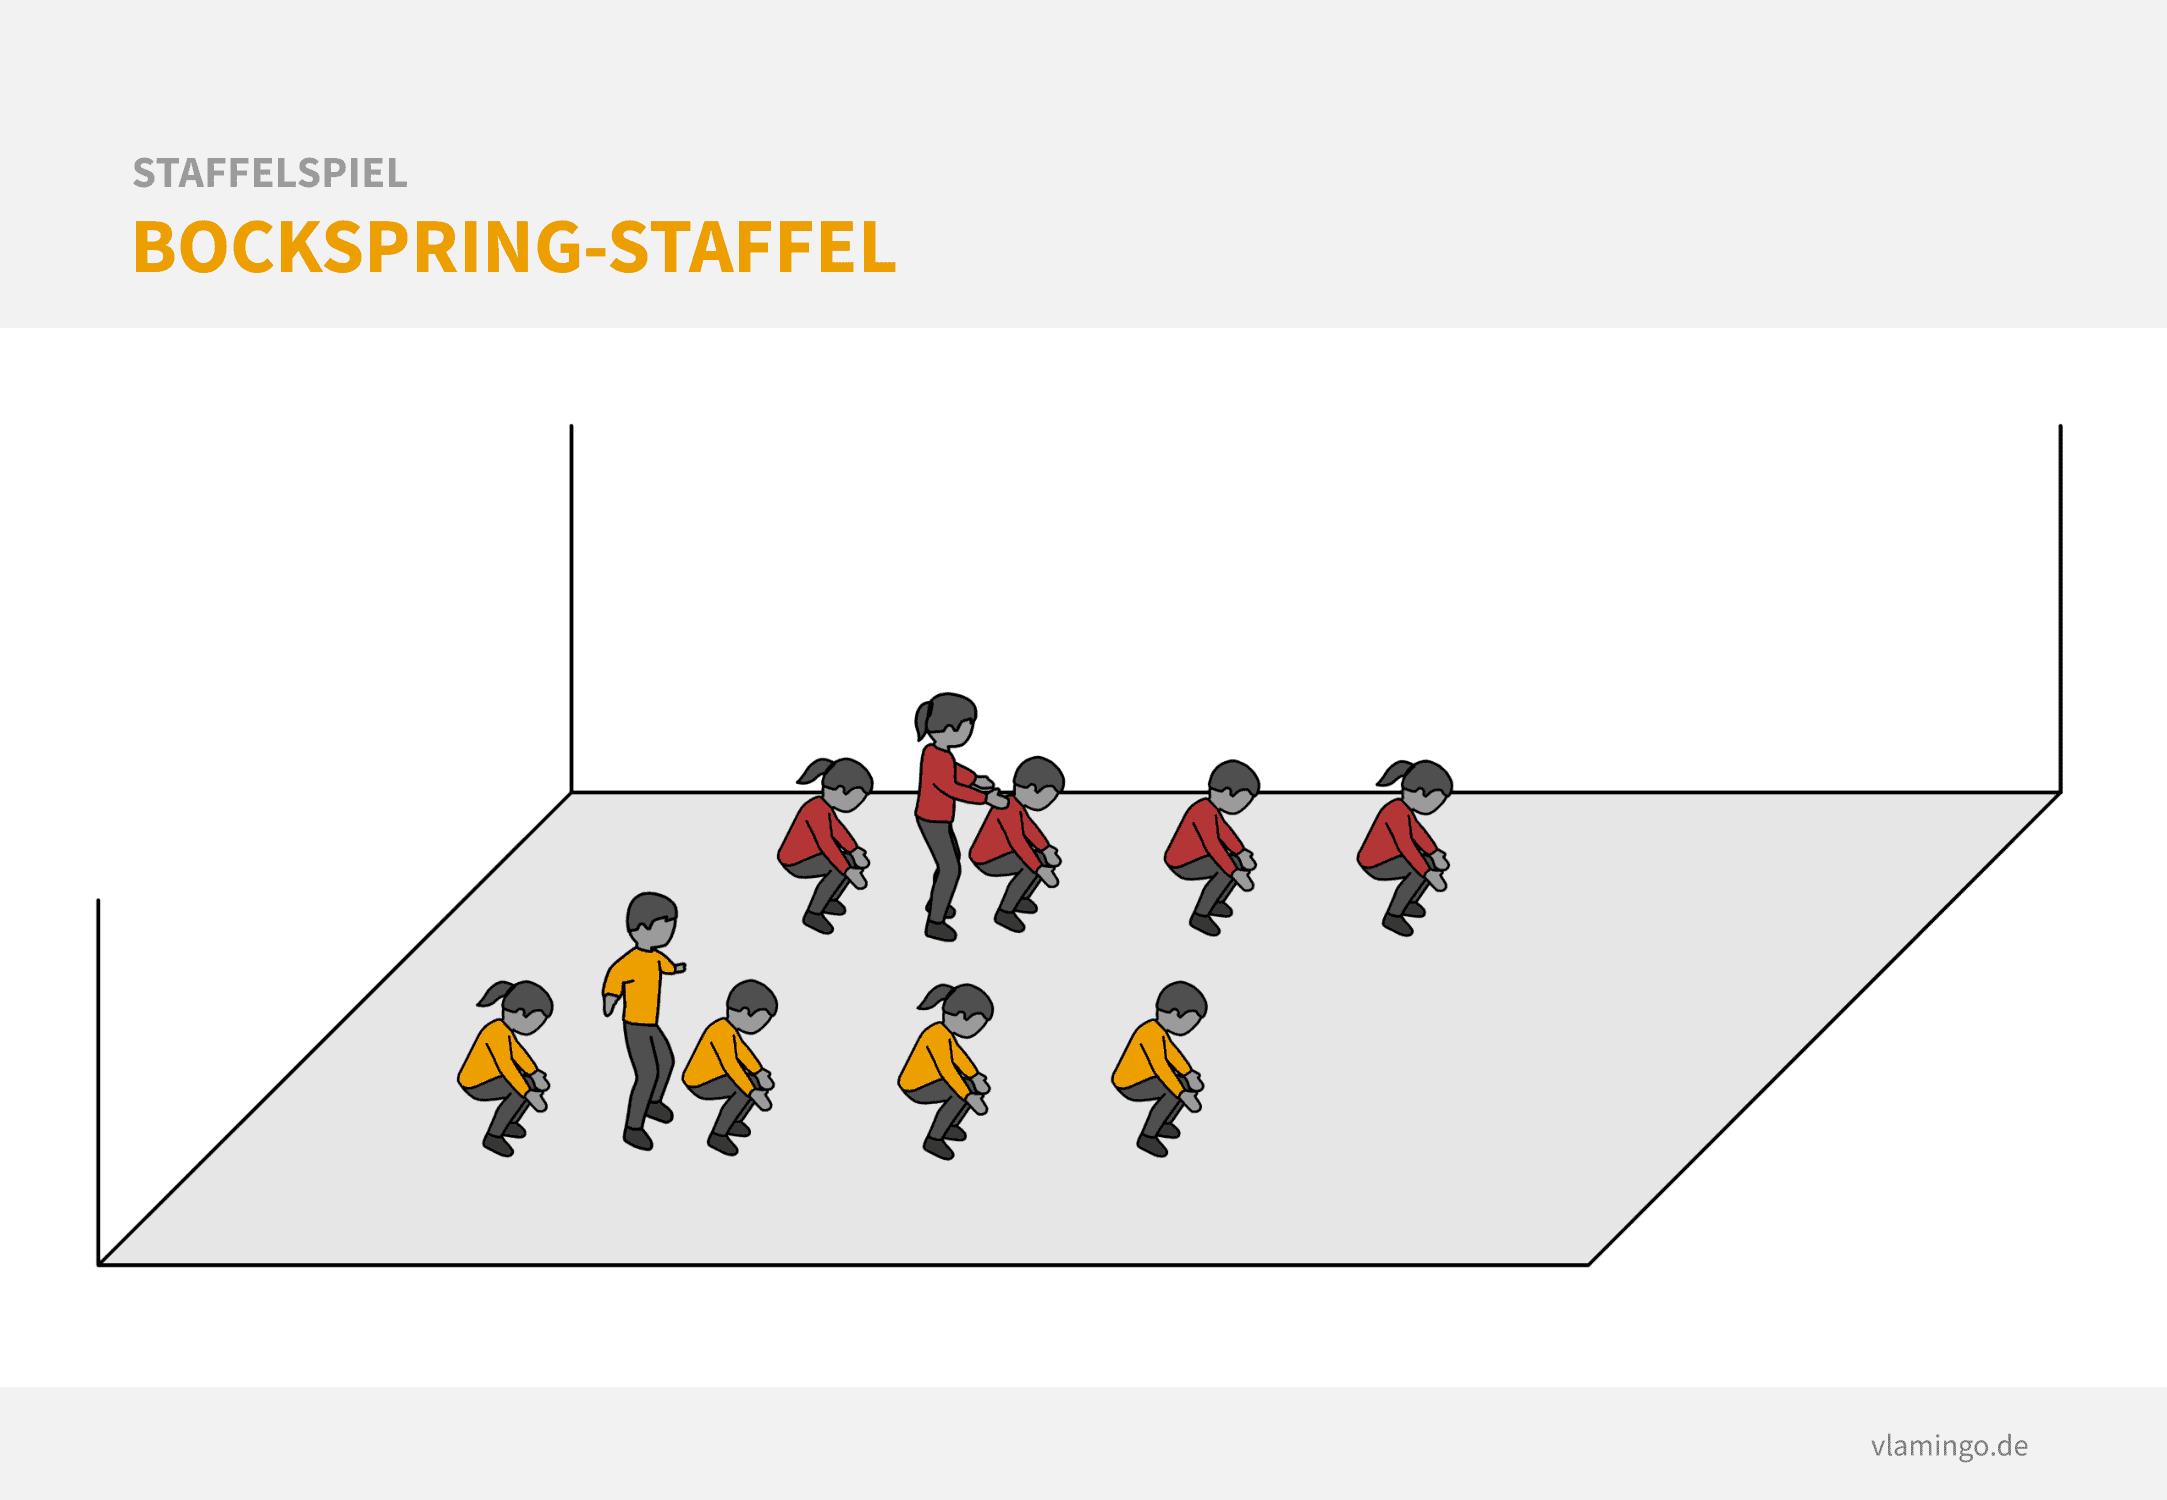 Staffelspiel - Bockspring-Staffel